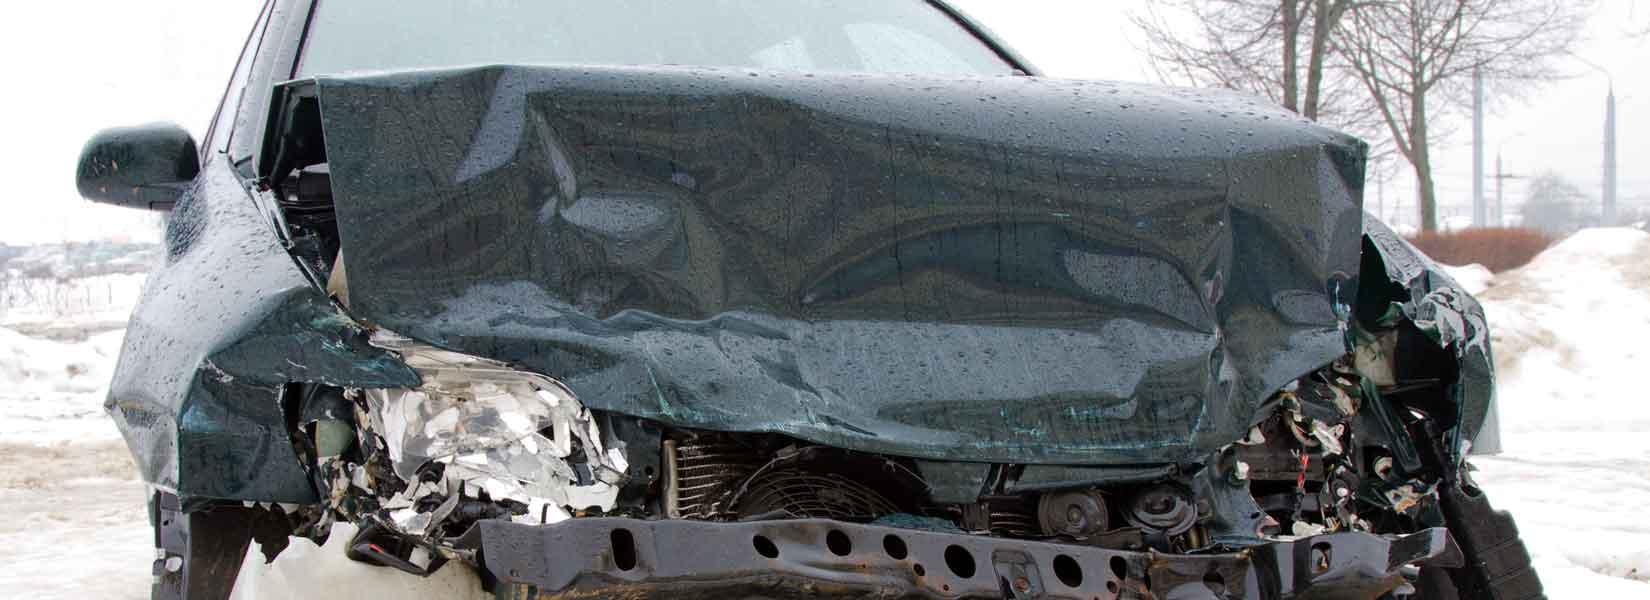 I-75 Crash Closes Interstate for Hours